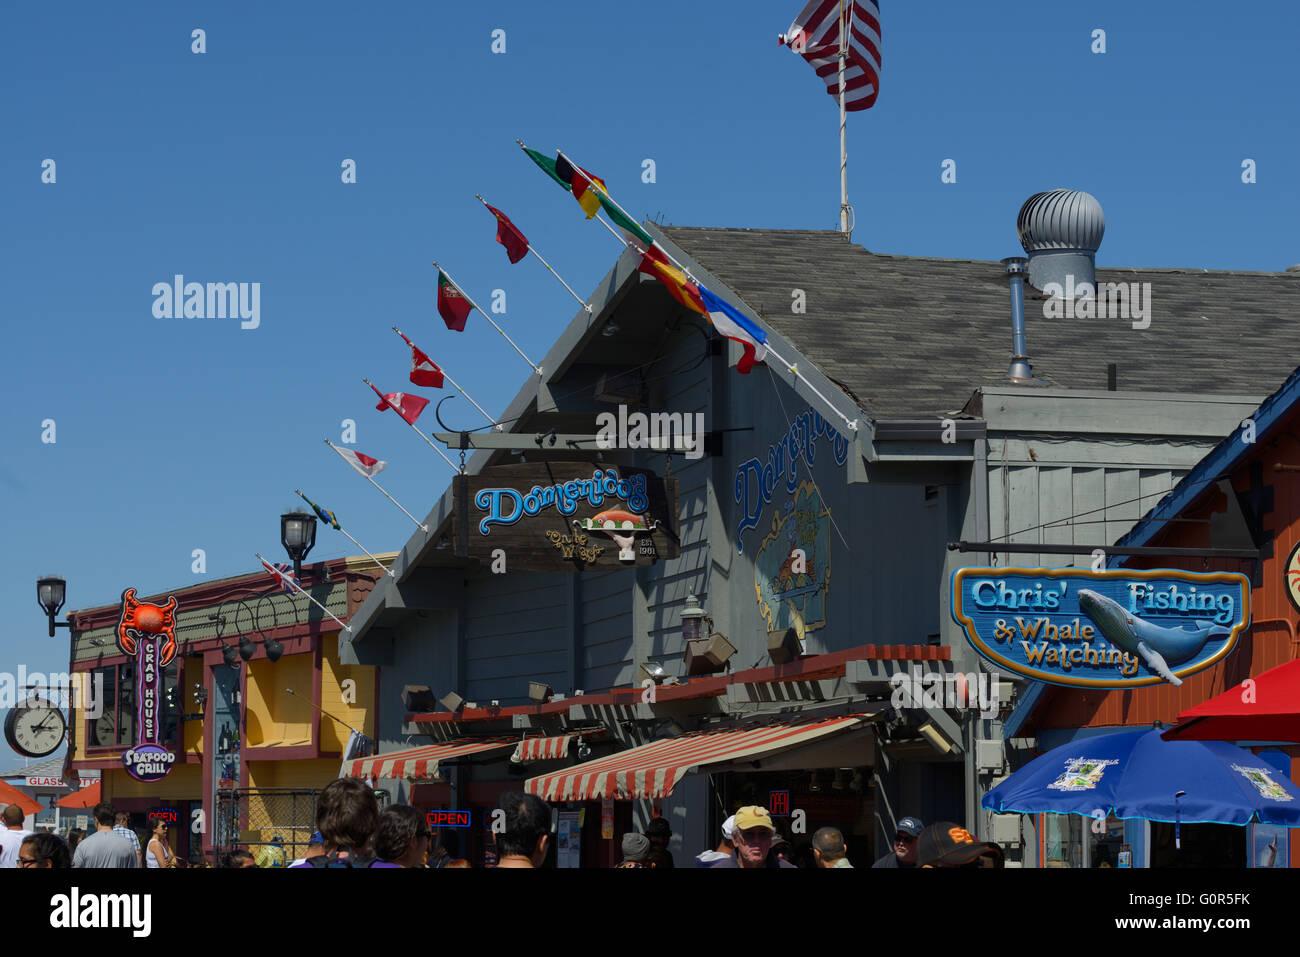 Fisherman's Wharf and Harbor, Monterey Bay CA - Stock Image